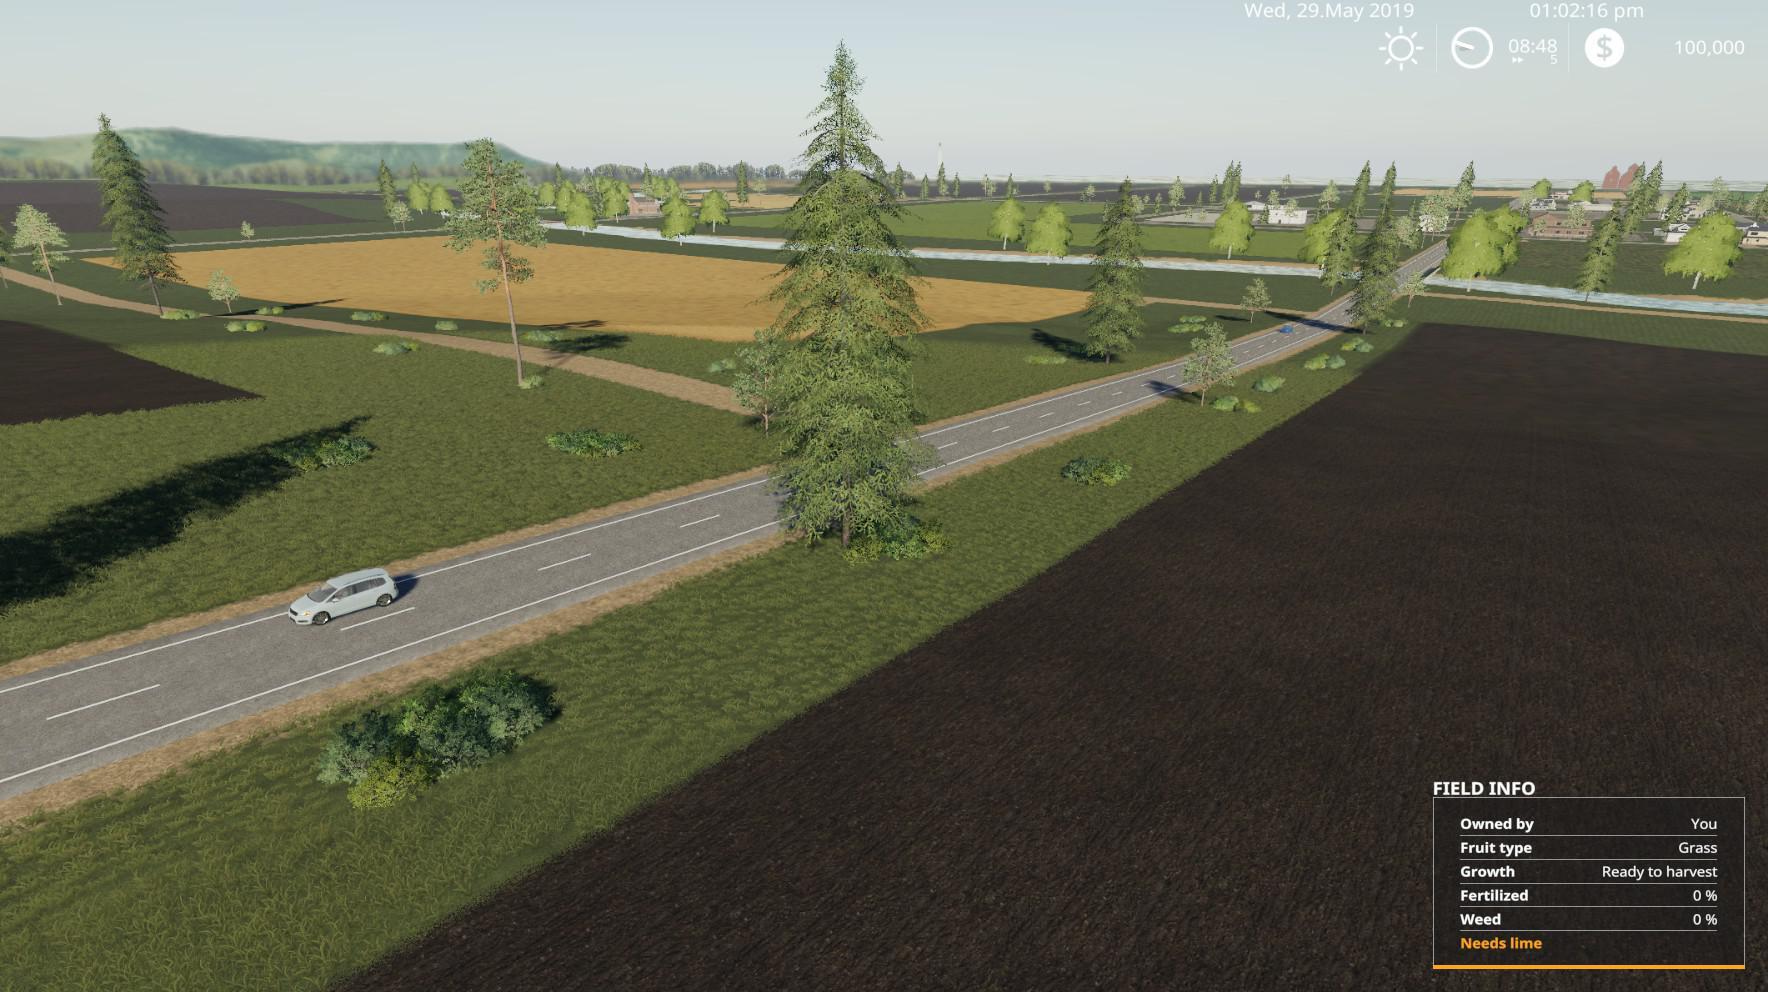 OLD TIMERS FARM V1 1c | FS19 mods, Farming simulator 19 mods